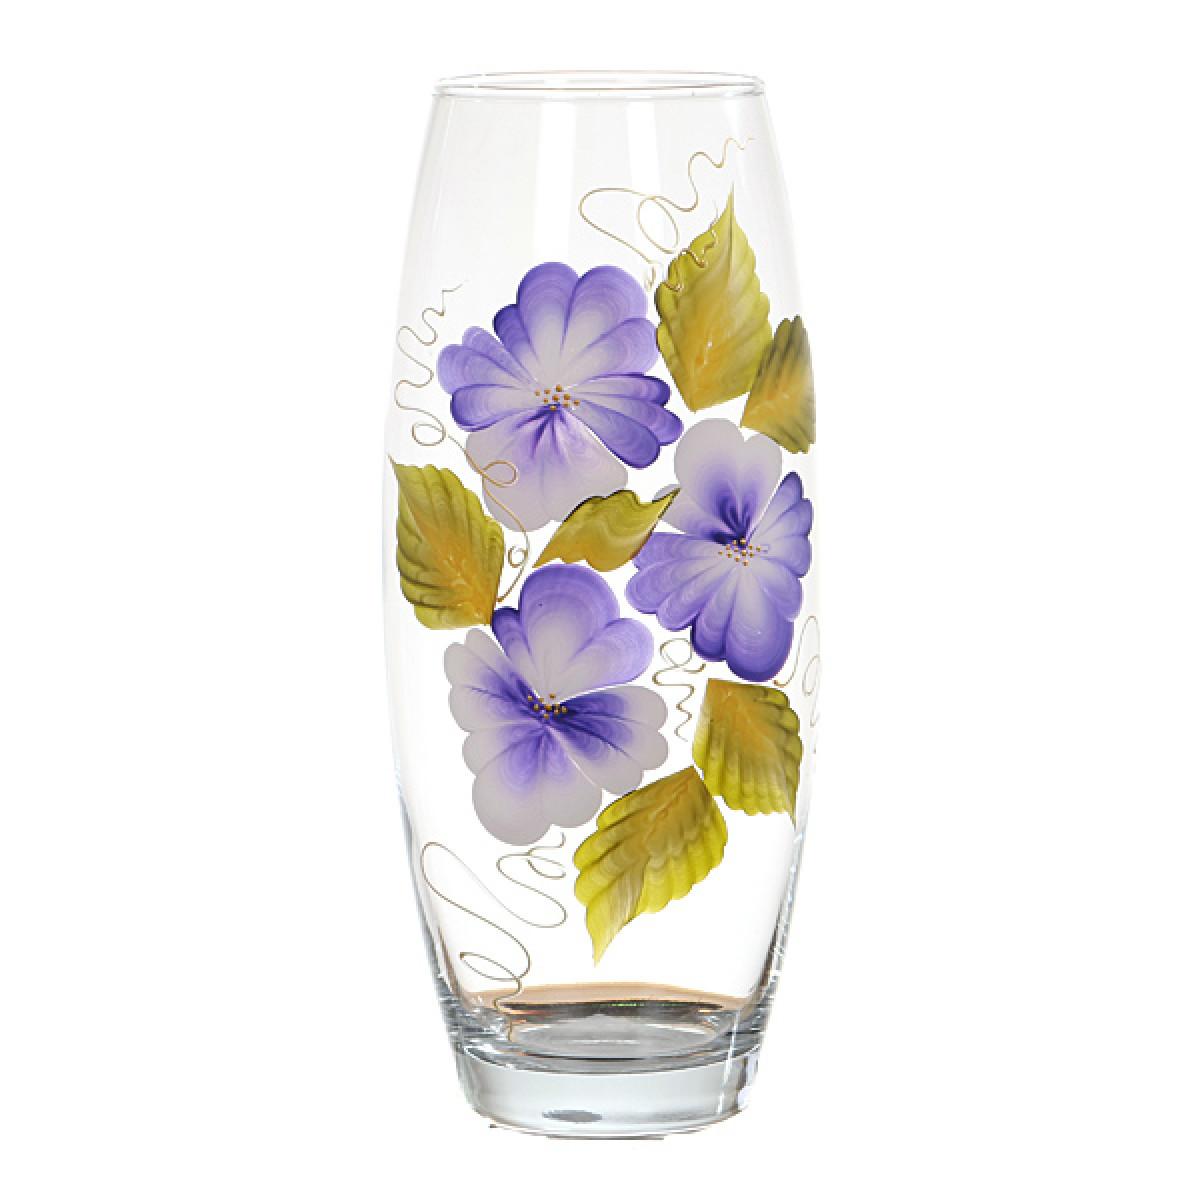 Прозрачная ваза с цветами